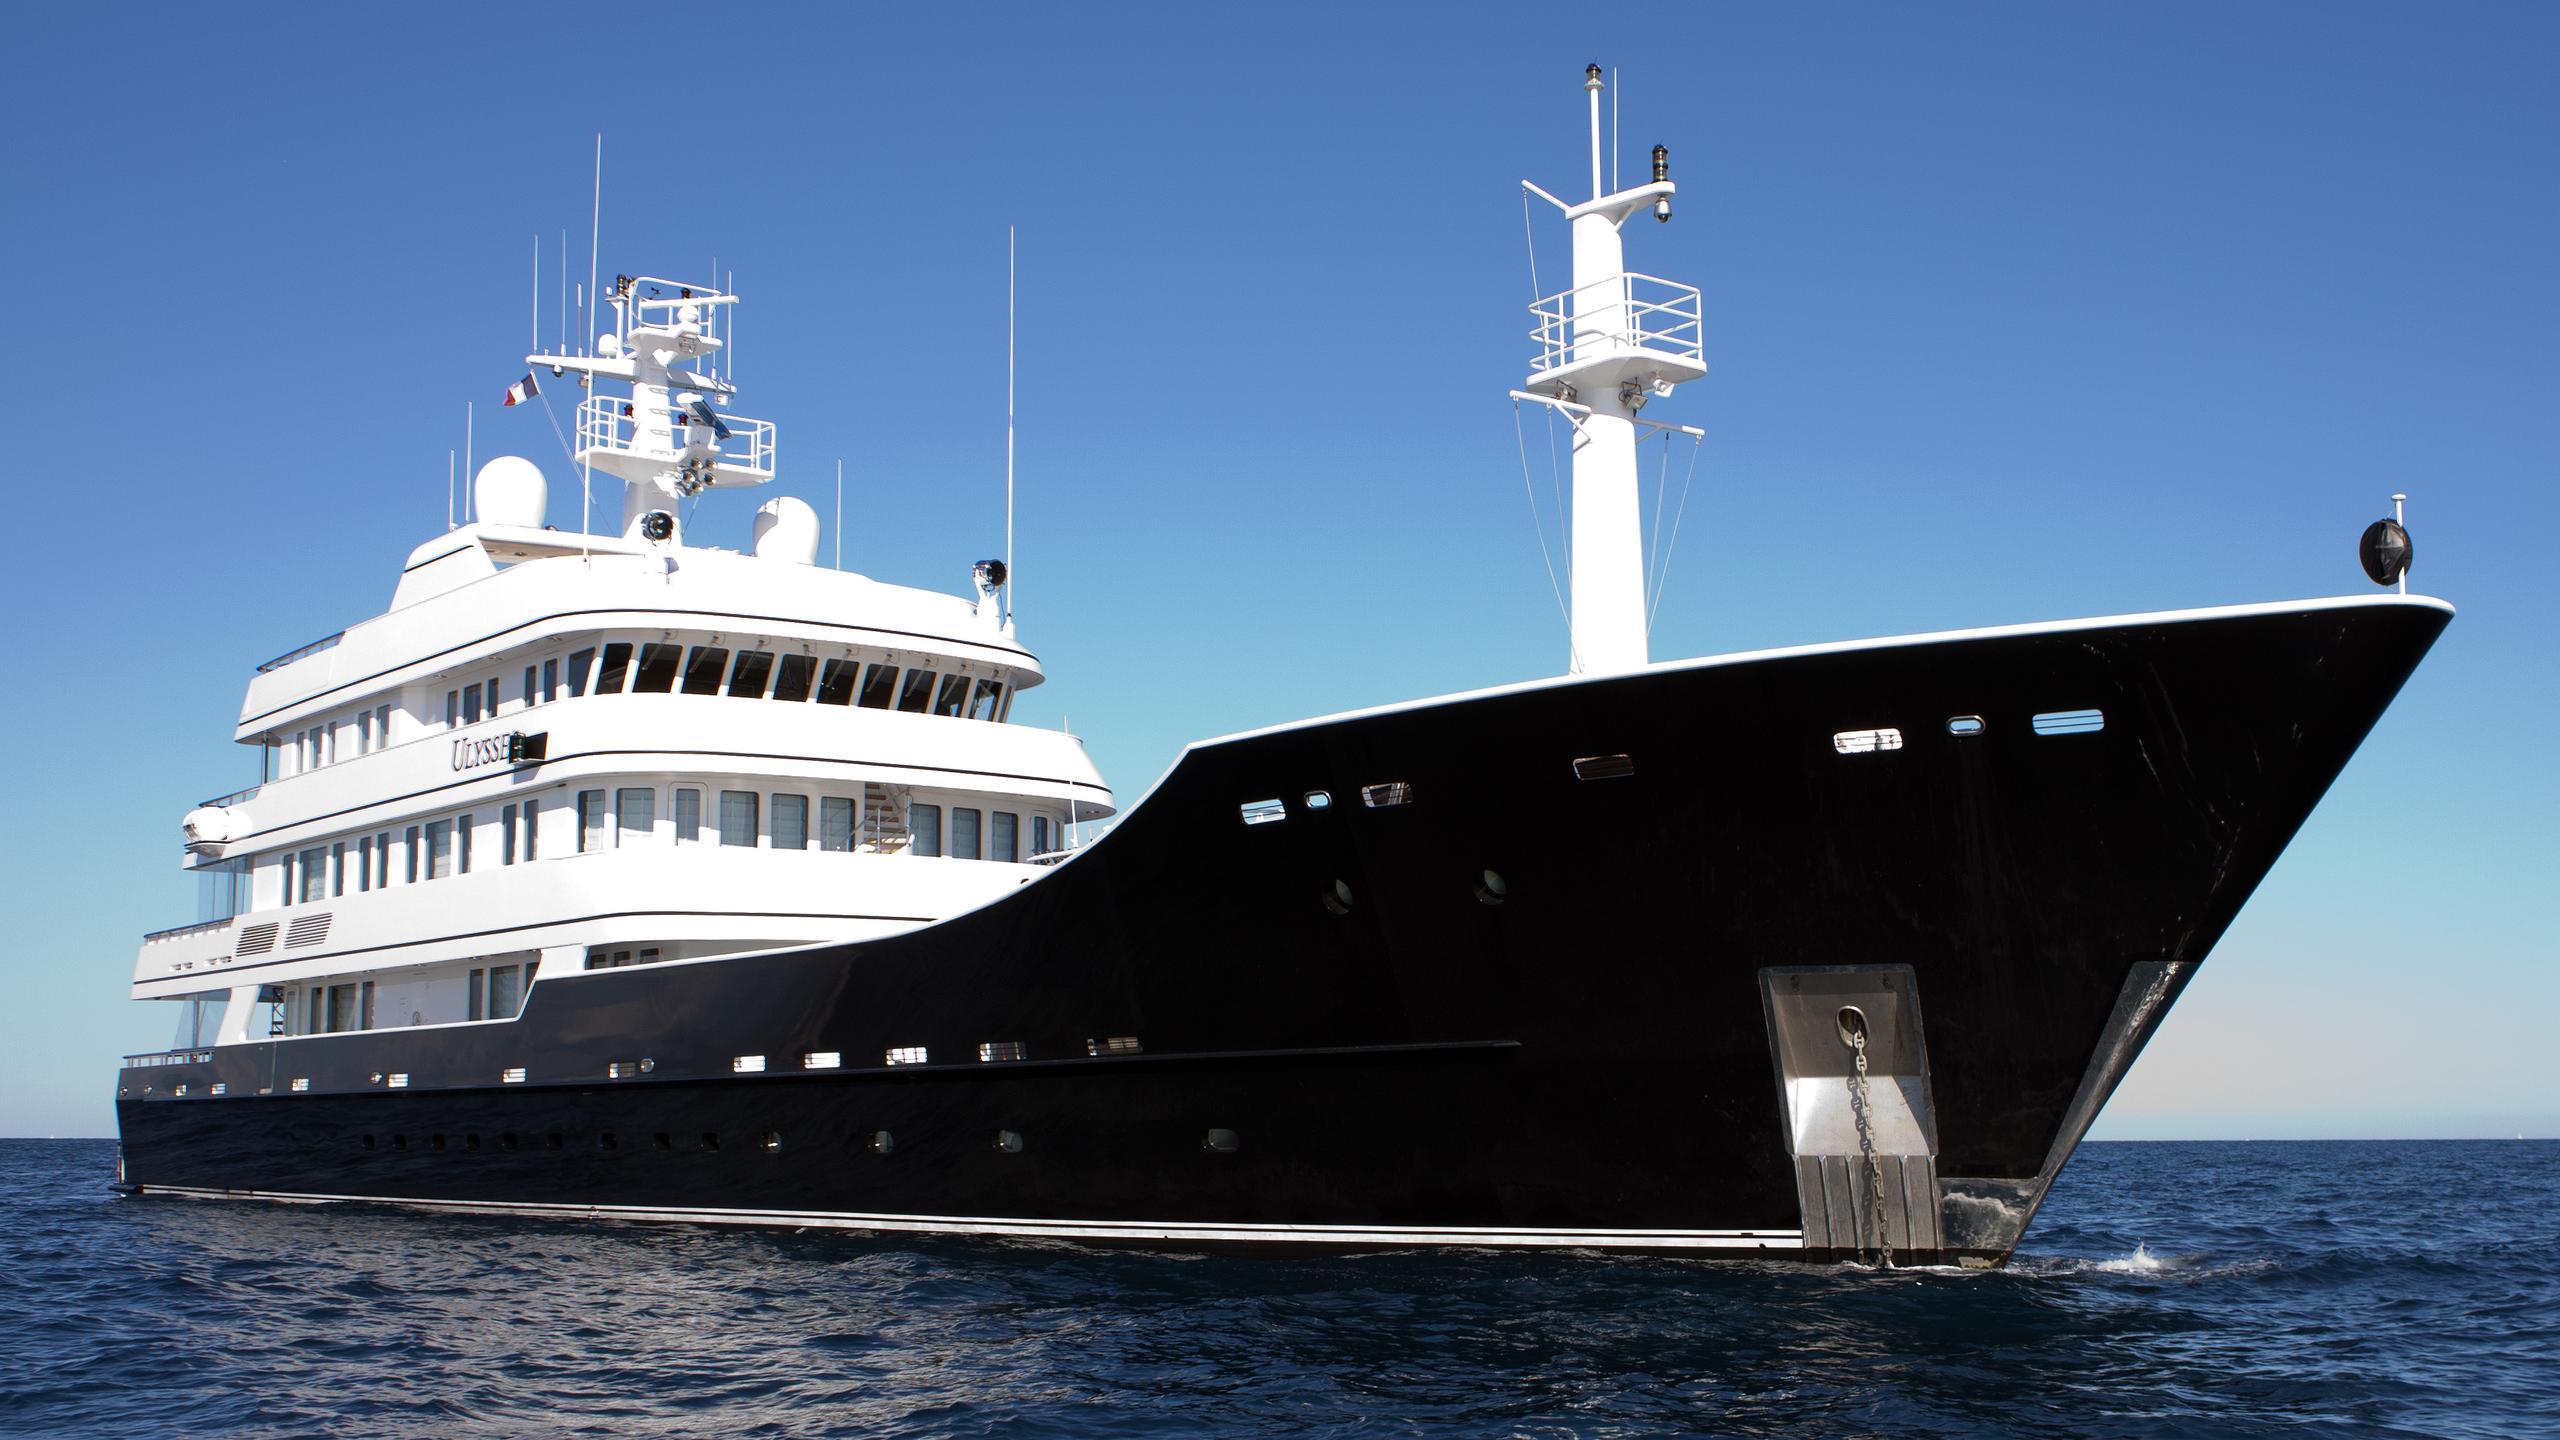 grand-rusalina-explorer-yacht-trinity-global-explorer-192-2003-59m-half-profile